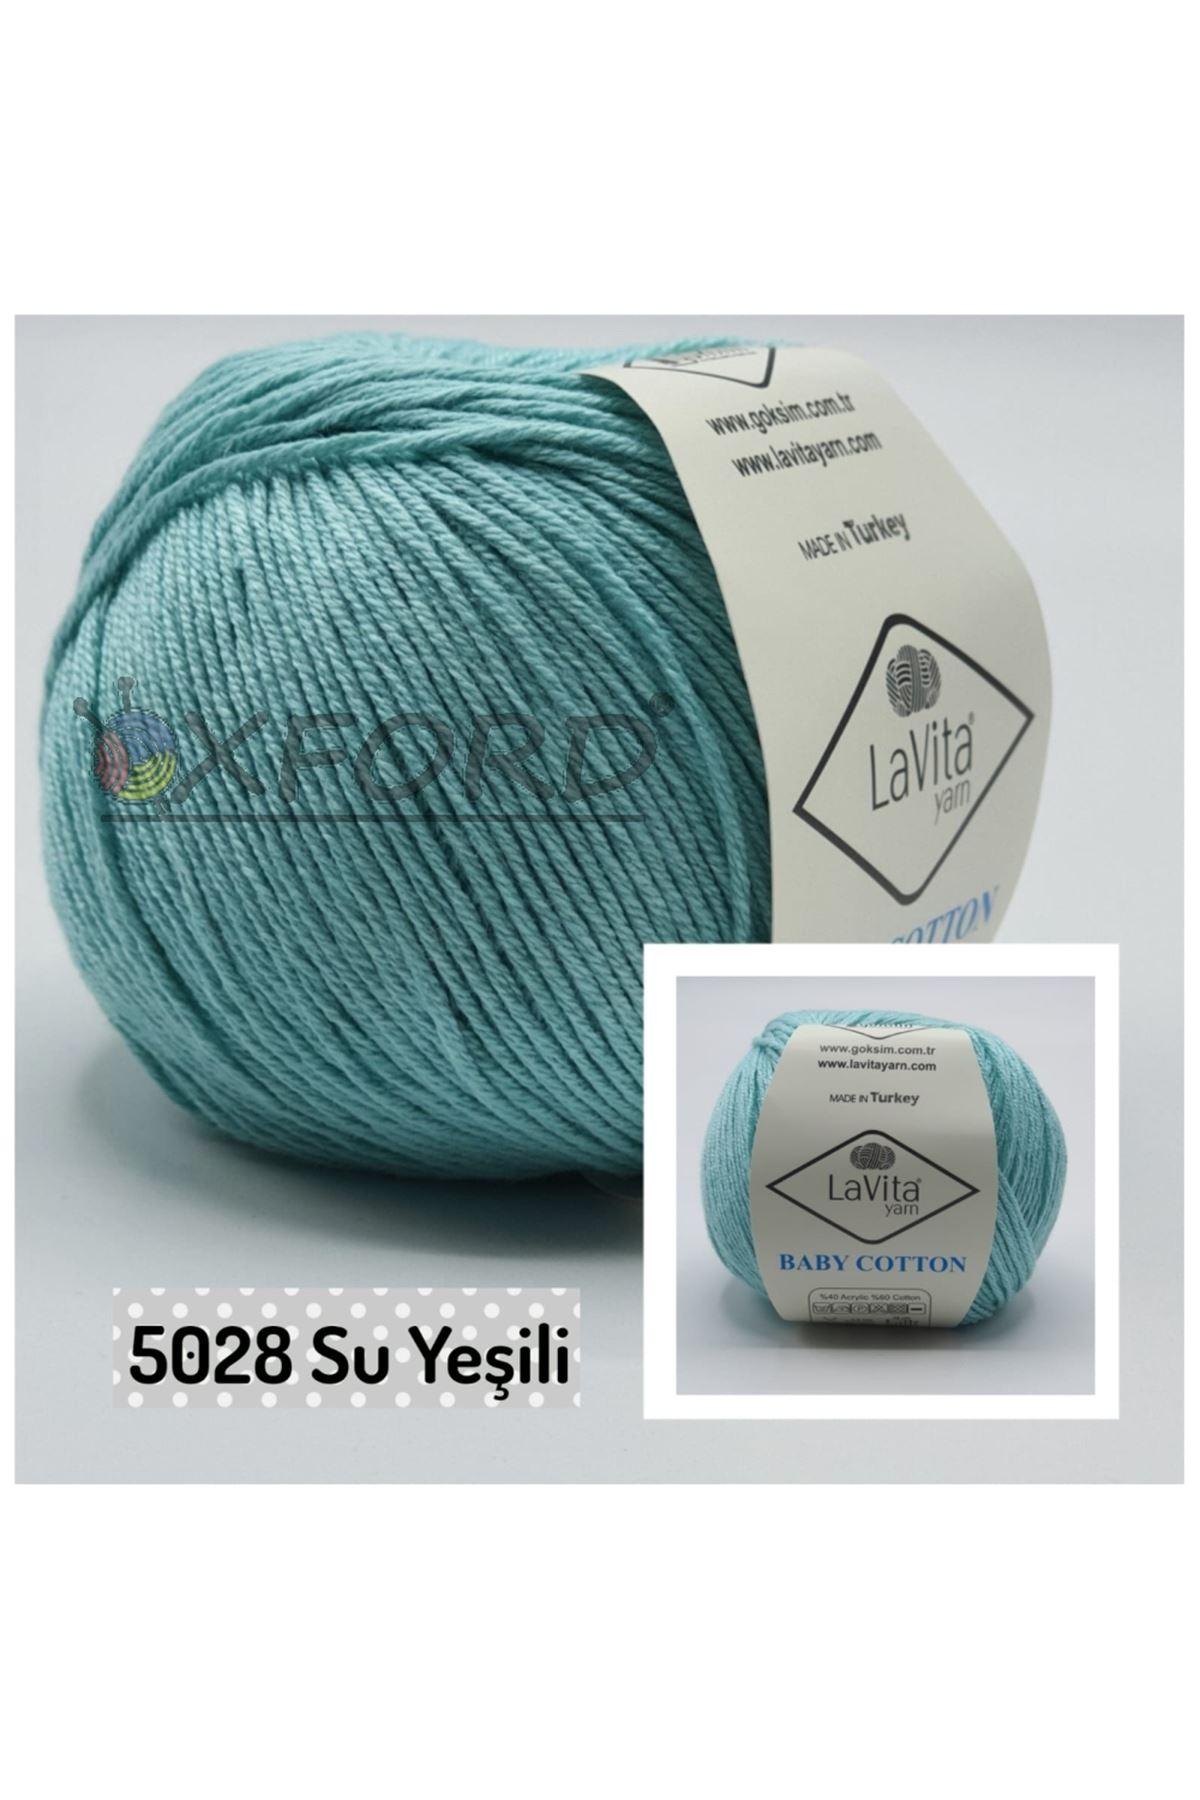 Lavita Baby Cotton 5028 Su Yeşili